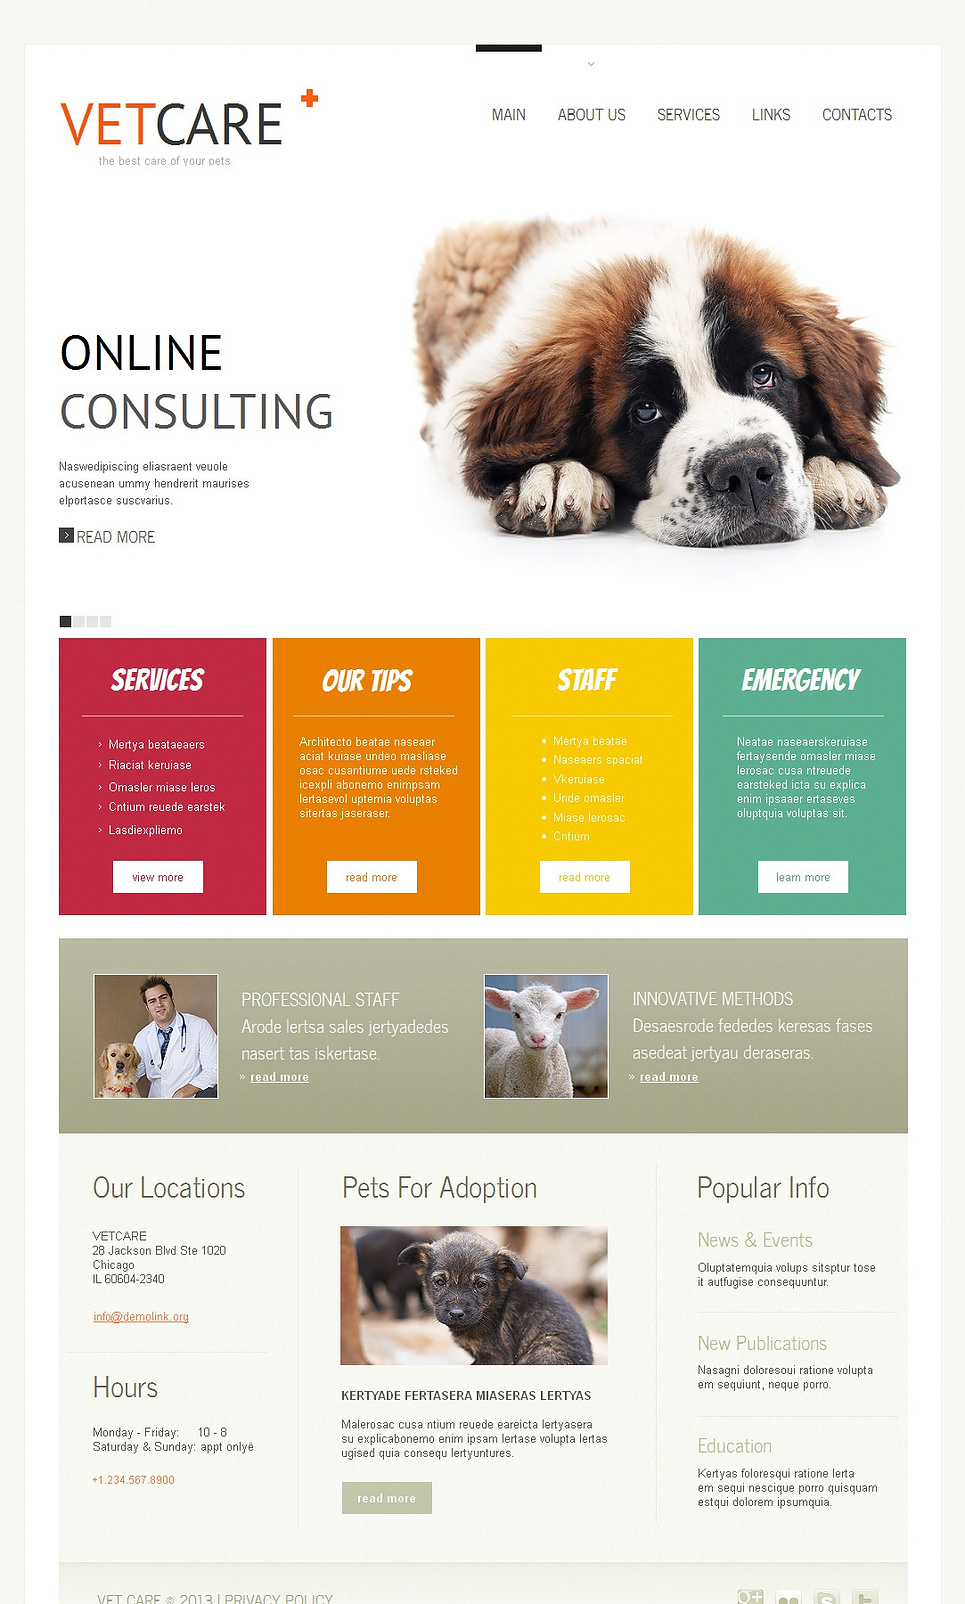 Veterinary Website Template Designed in Modern Style - image